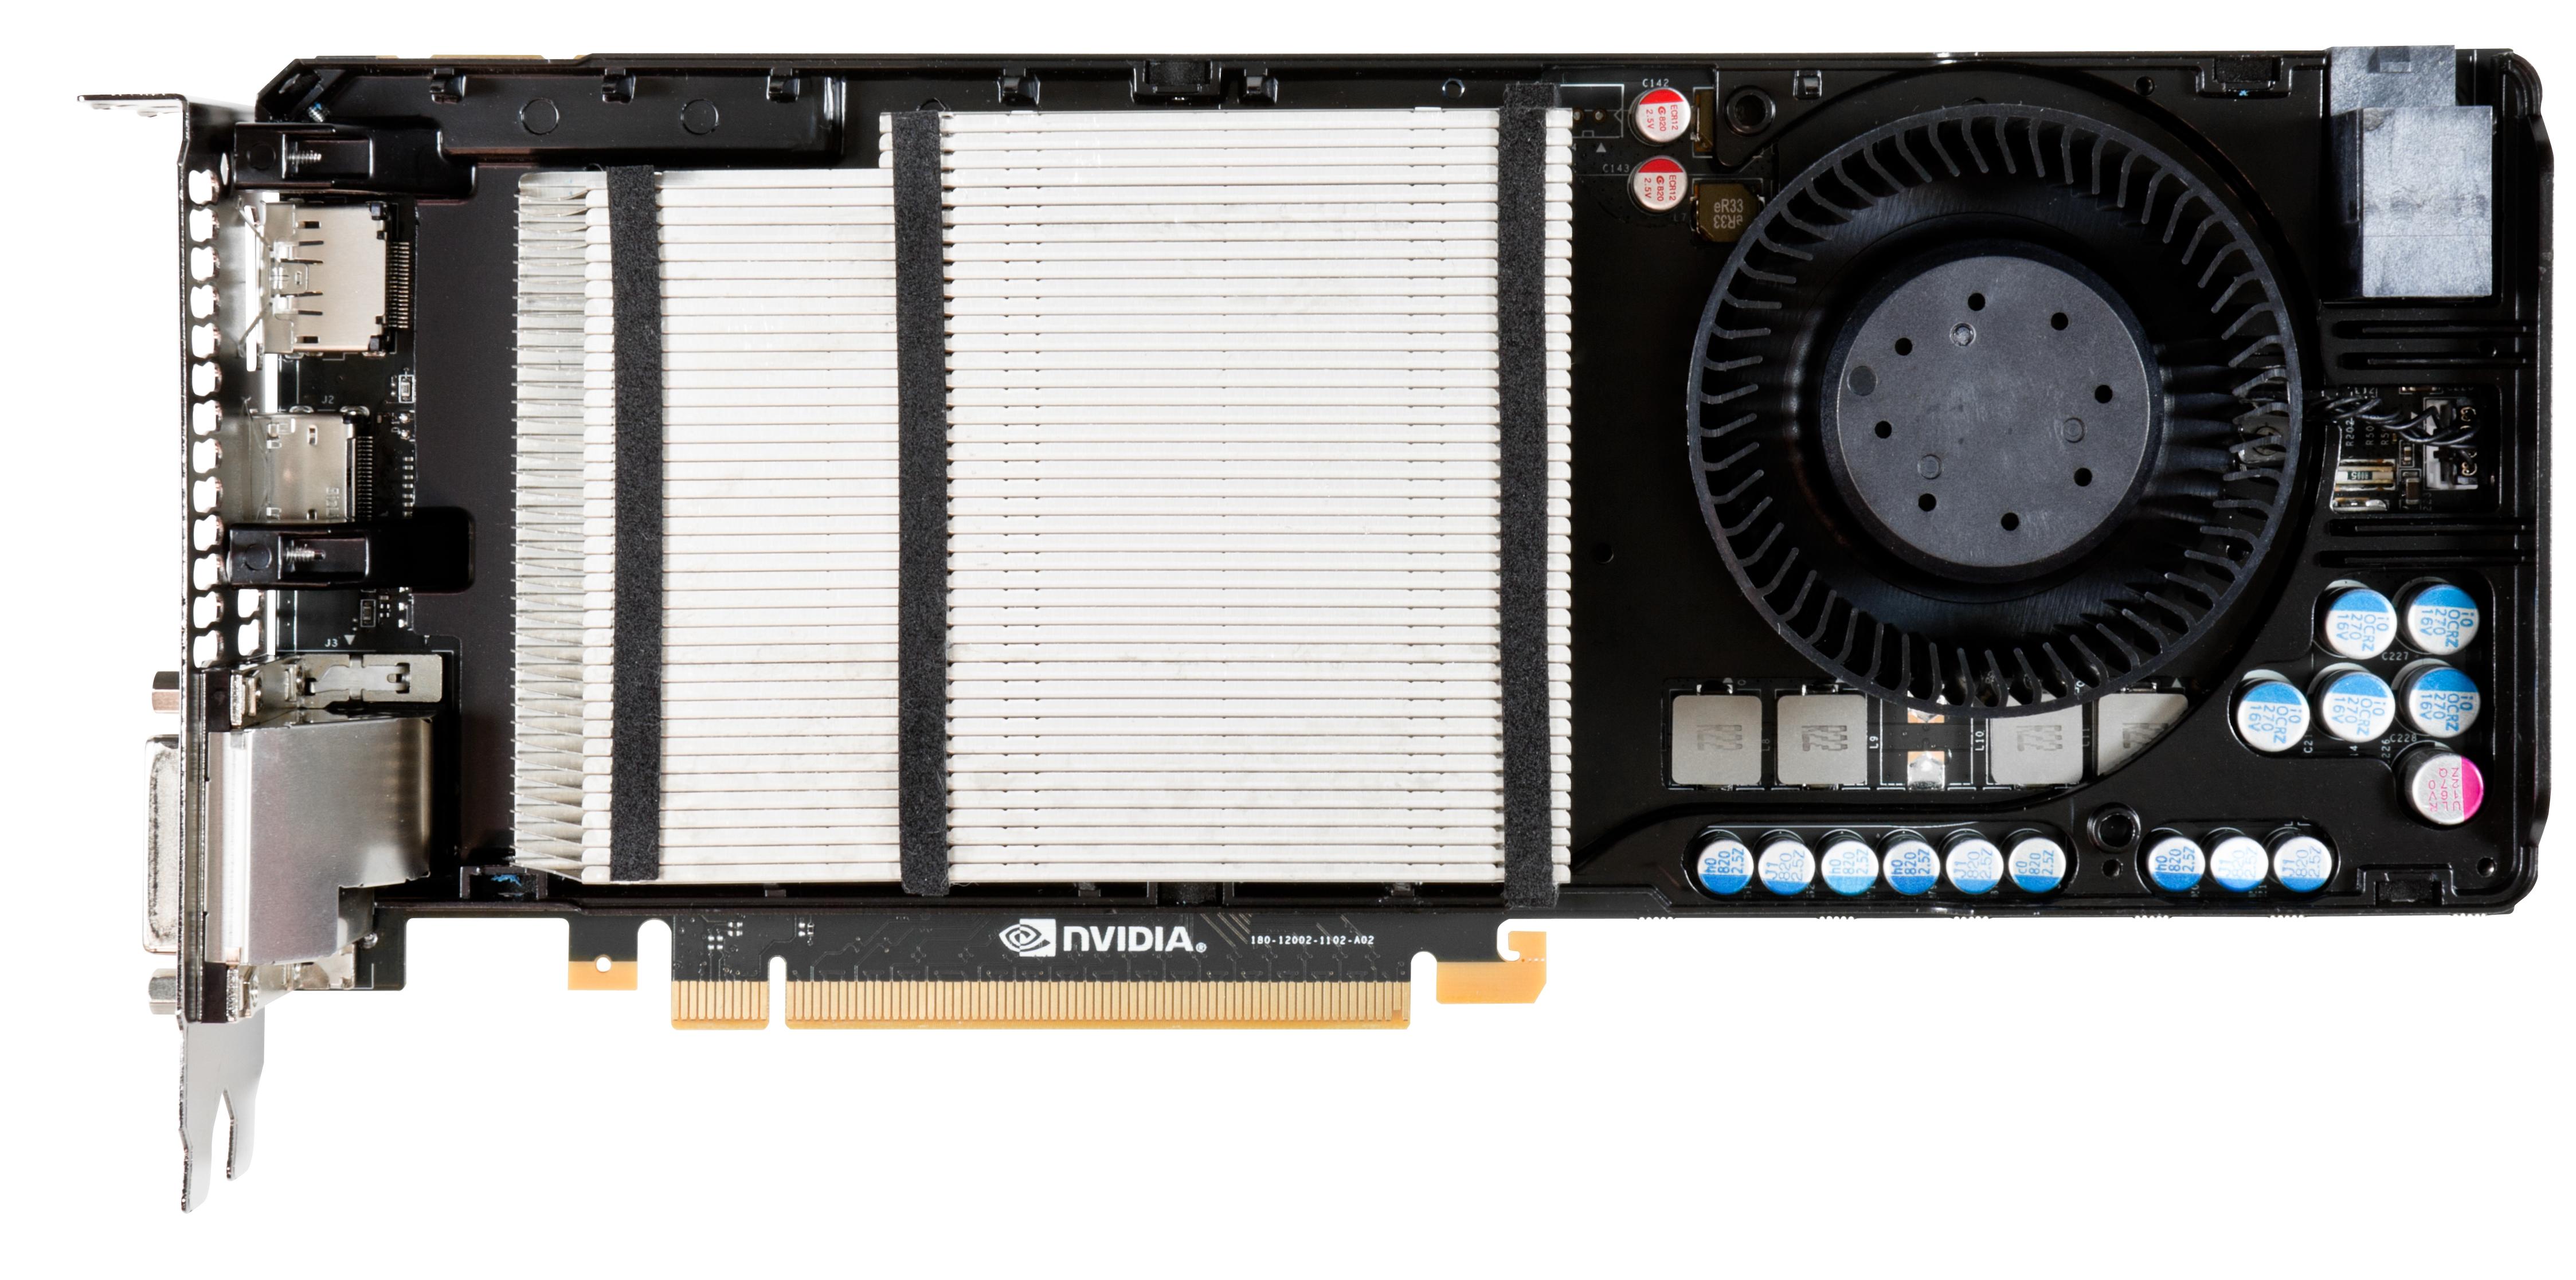 Meet the GeForce GTX 680 - NVIDIA GeForce GTX 680 Review: Retaking